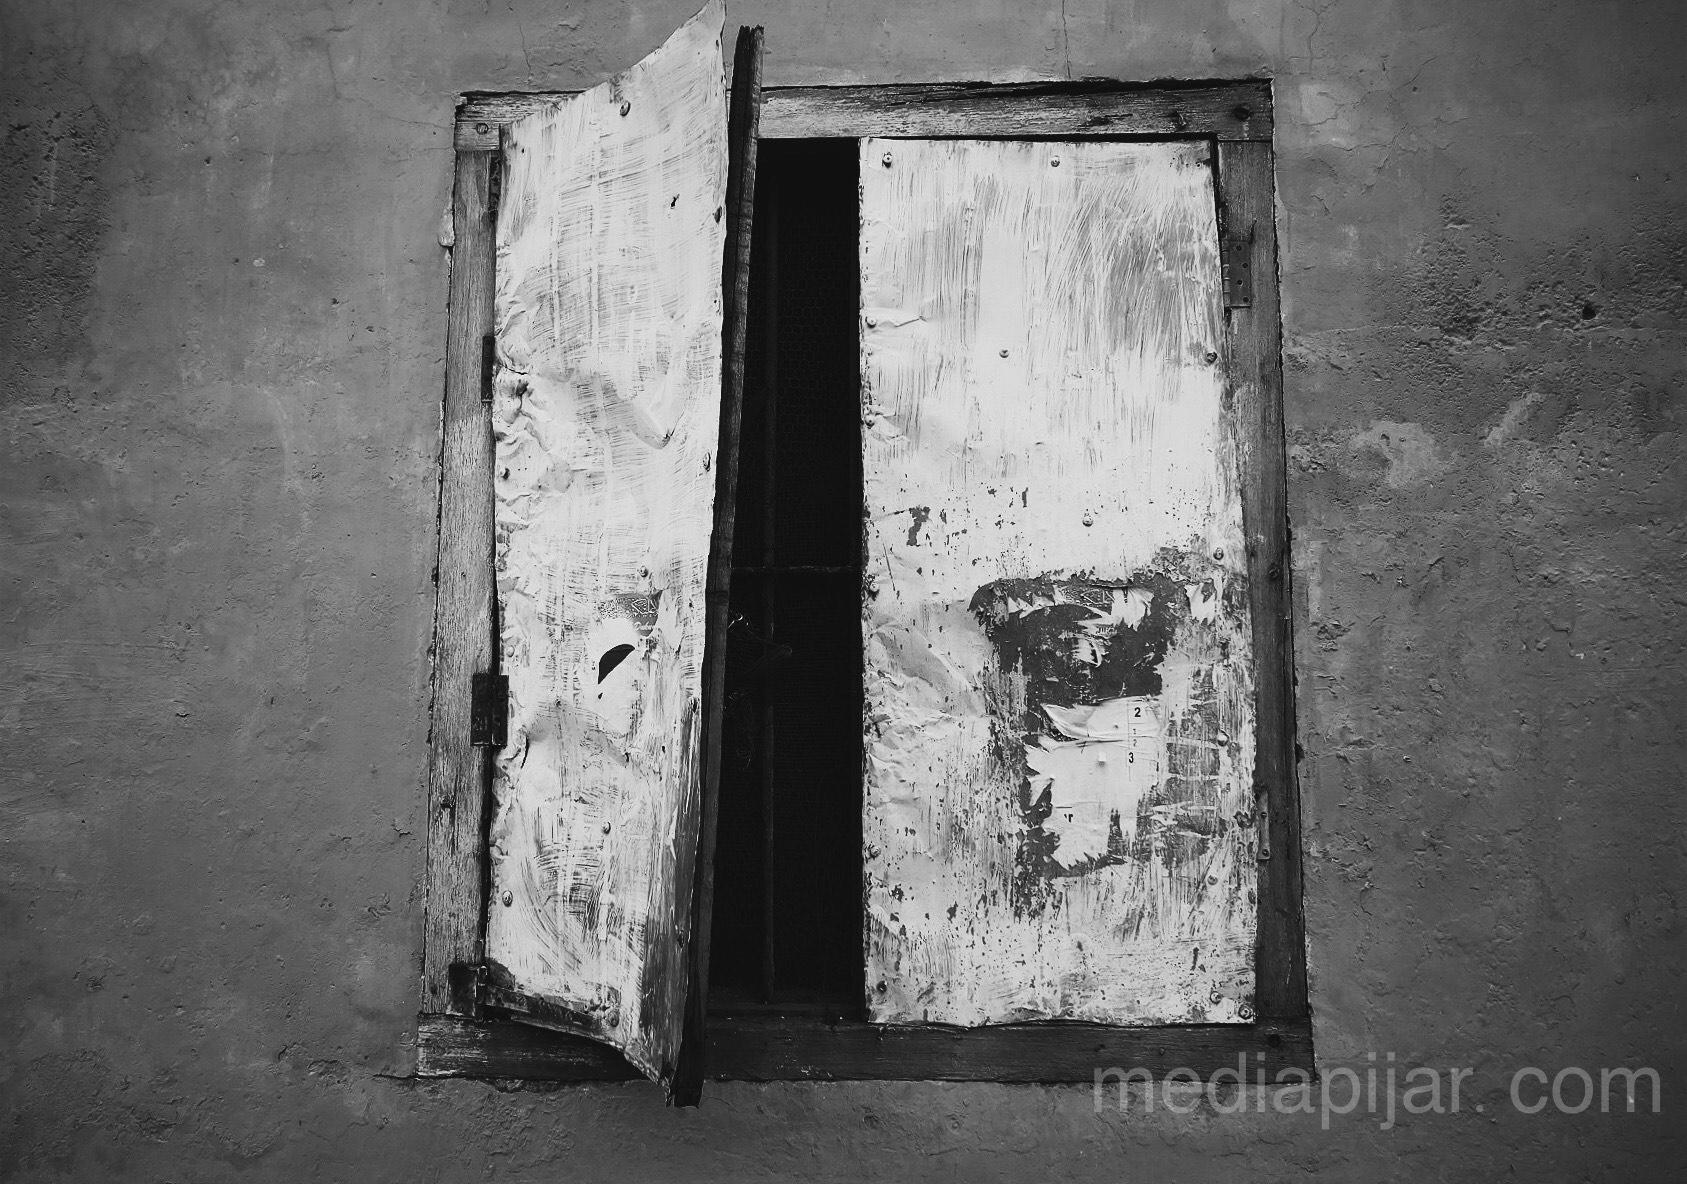 Jendela dibalik suatu tempat Fotografer: Putri Arum Marzura